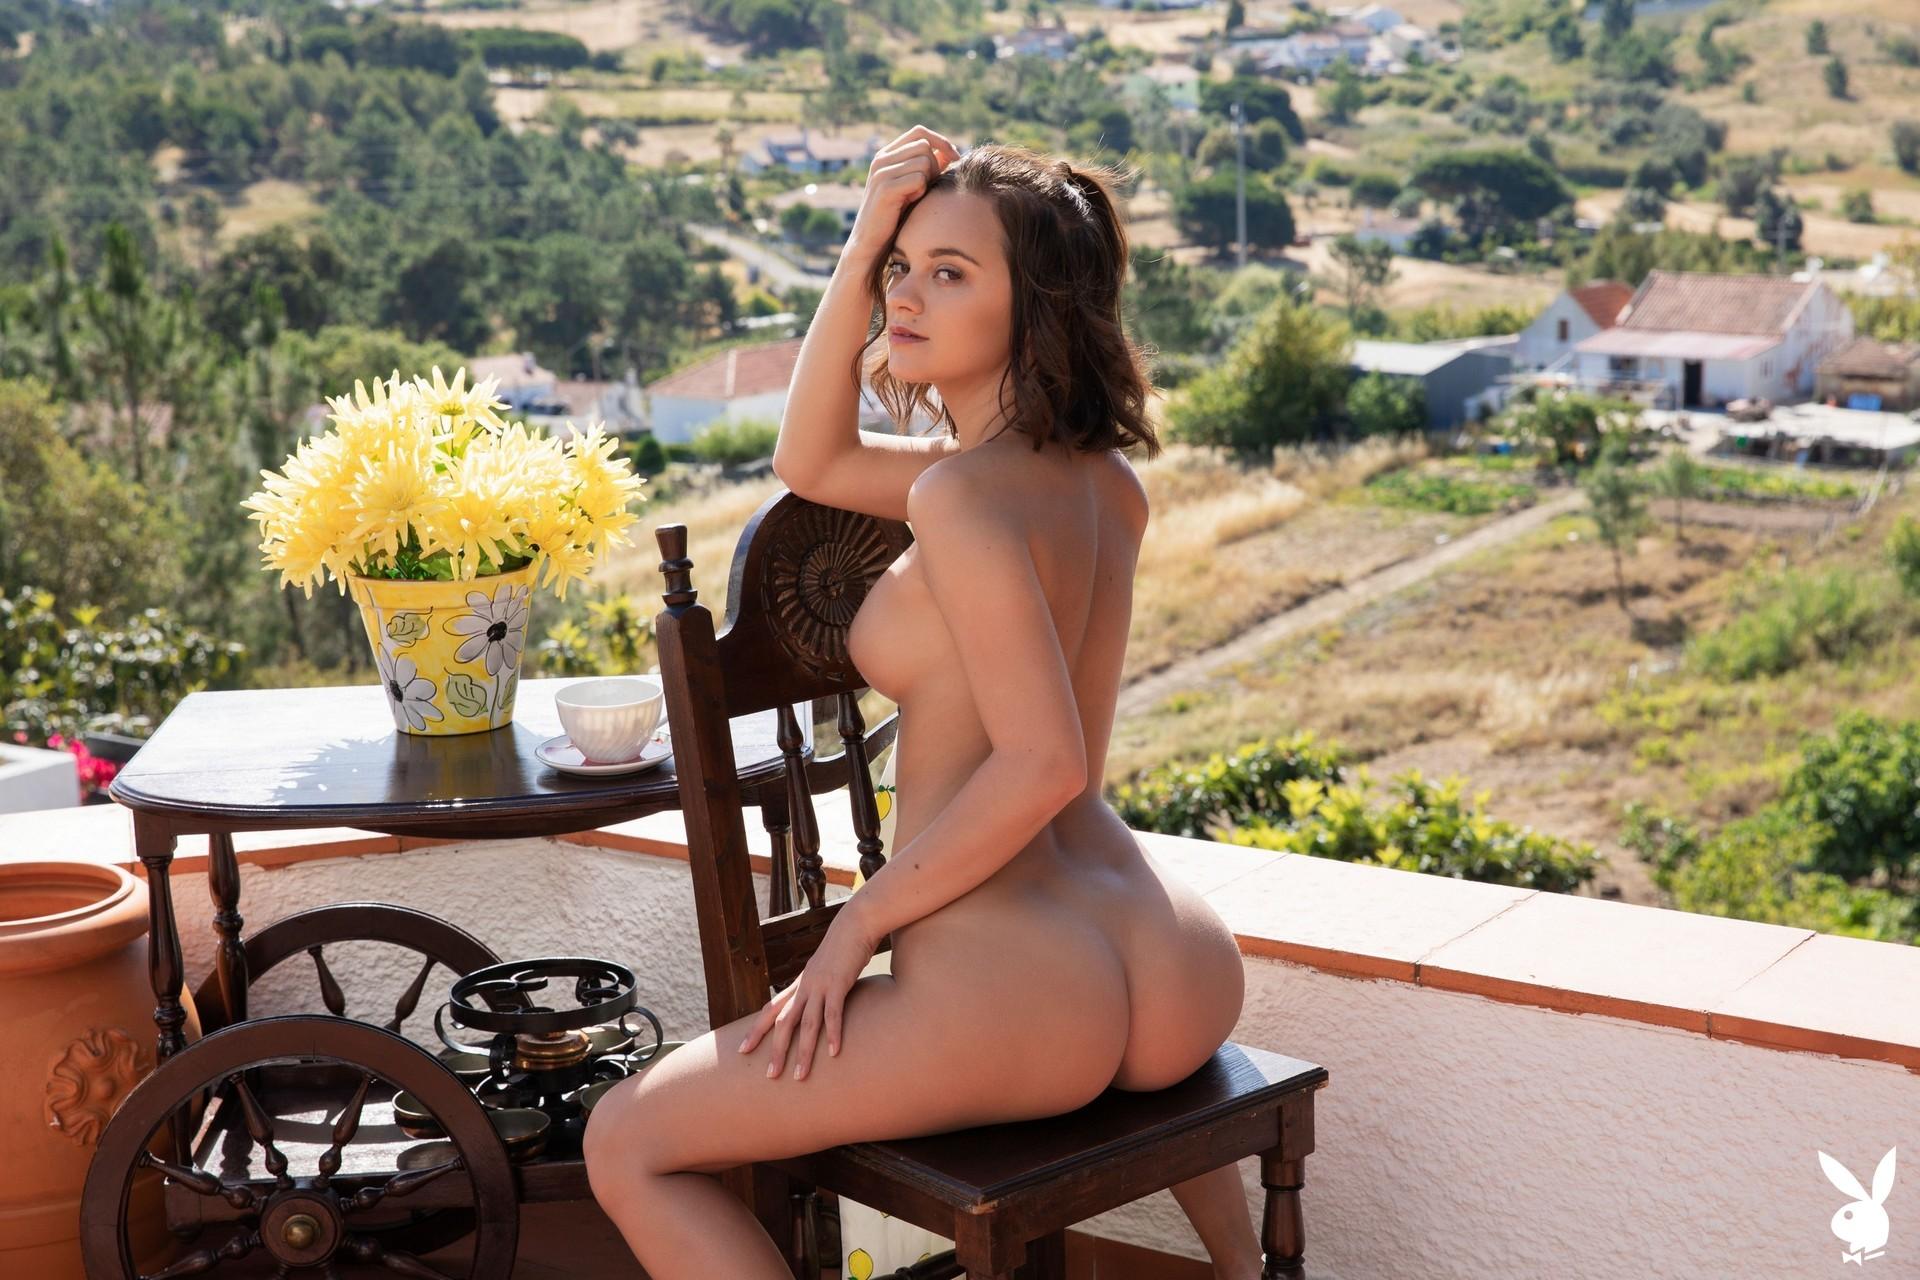 Marine Lecourt In Country Summit Playboy Plus (14)